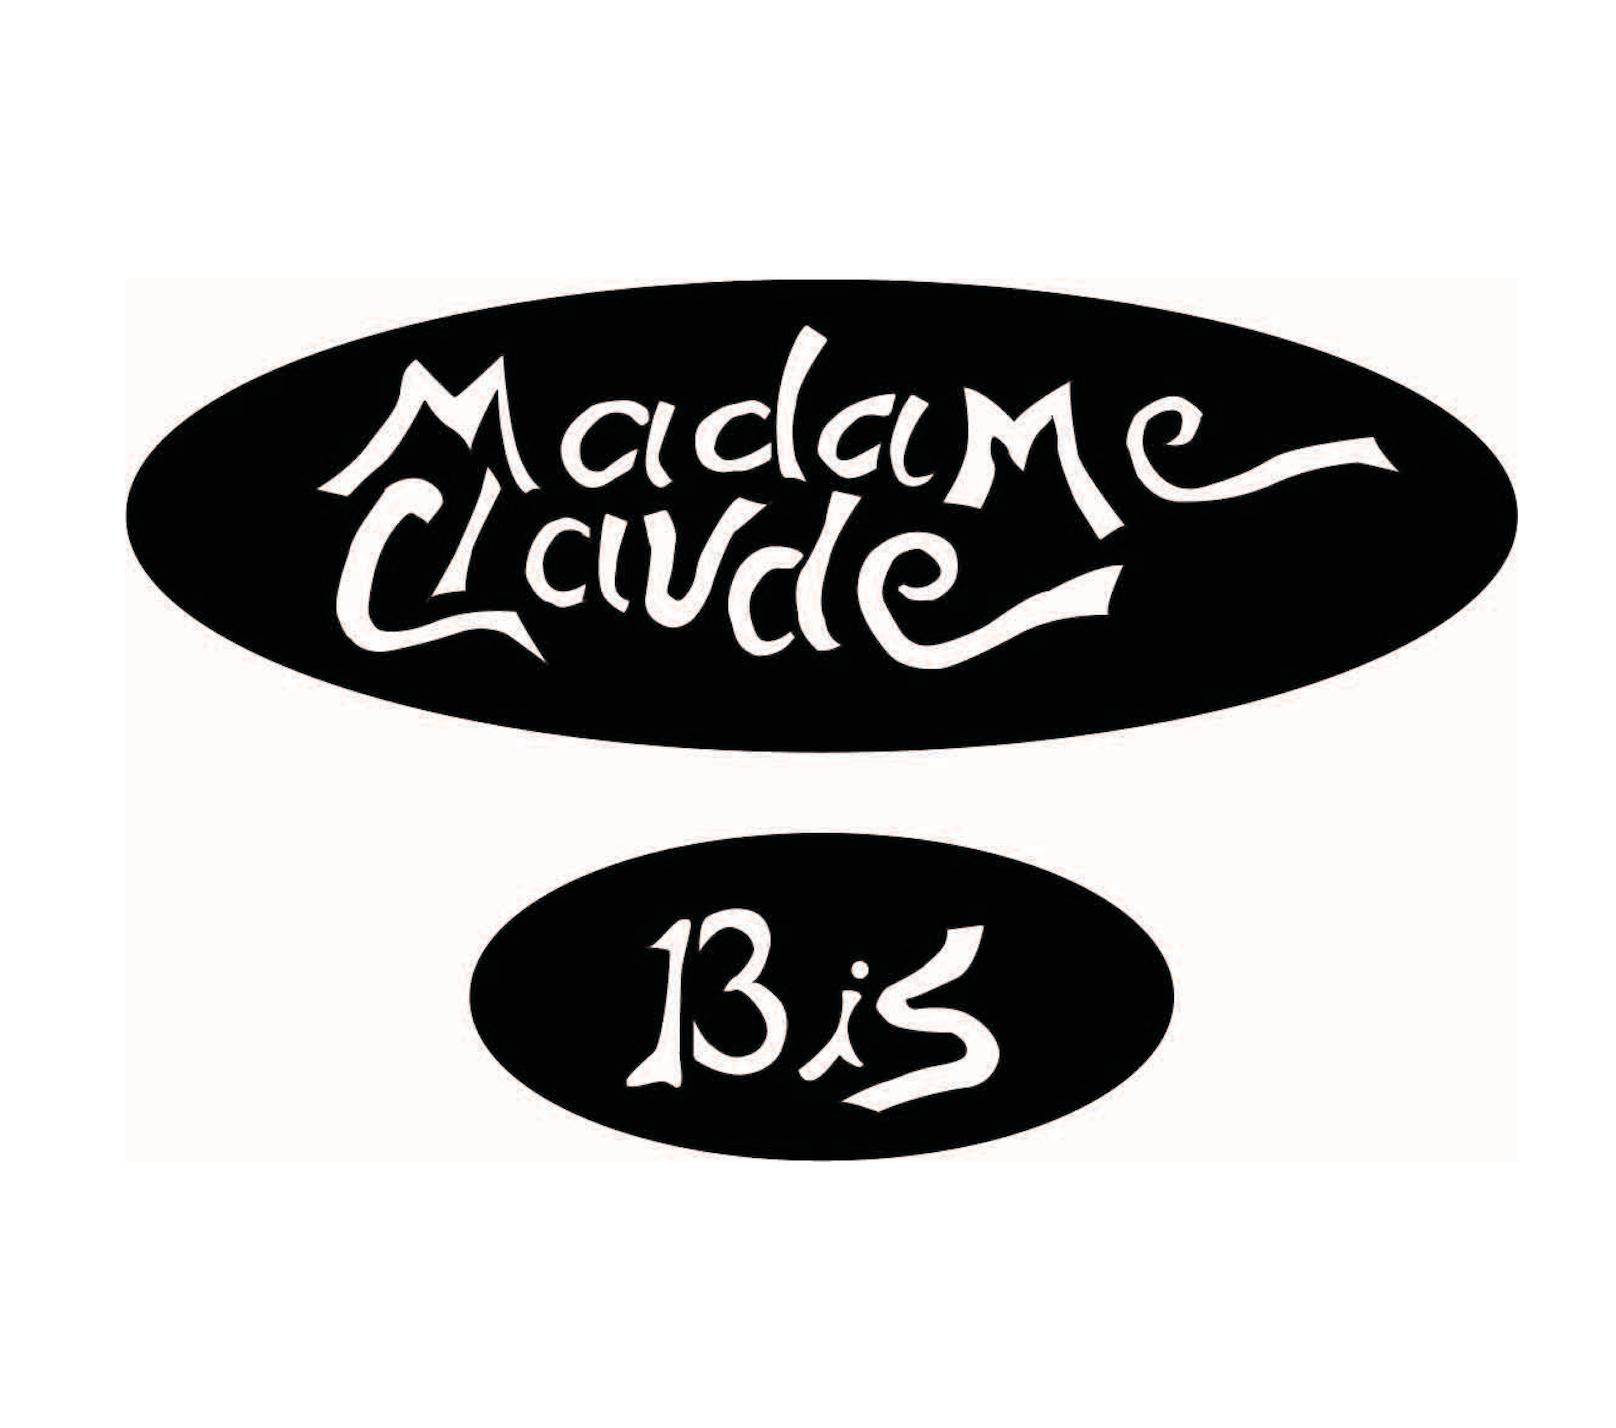 madame.png